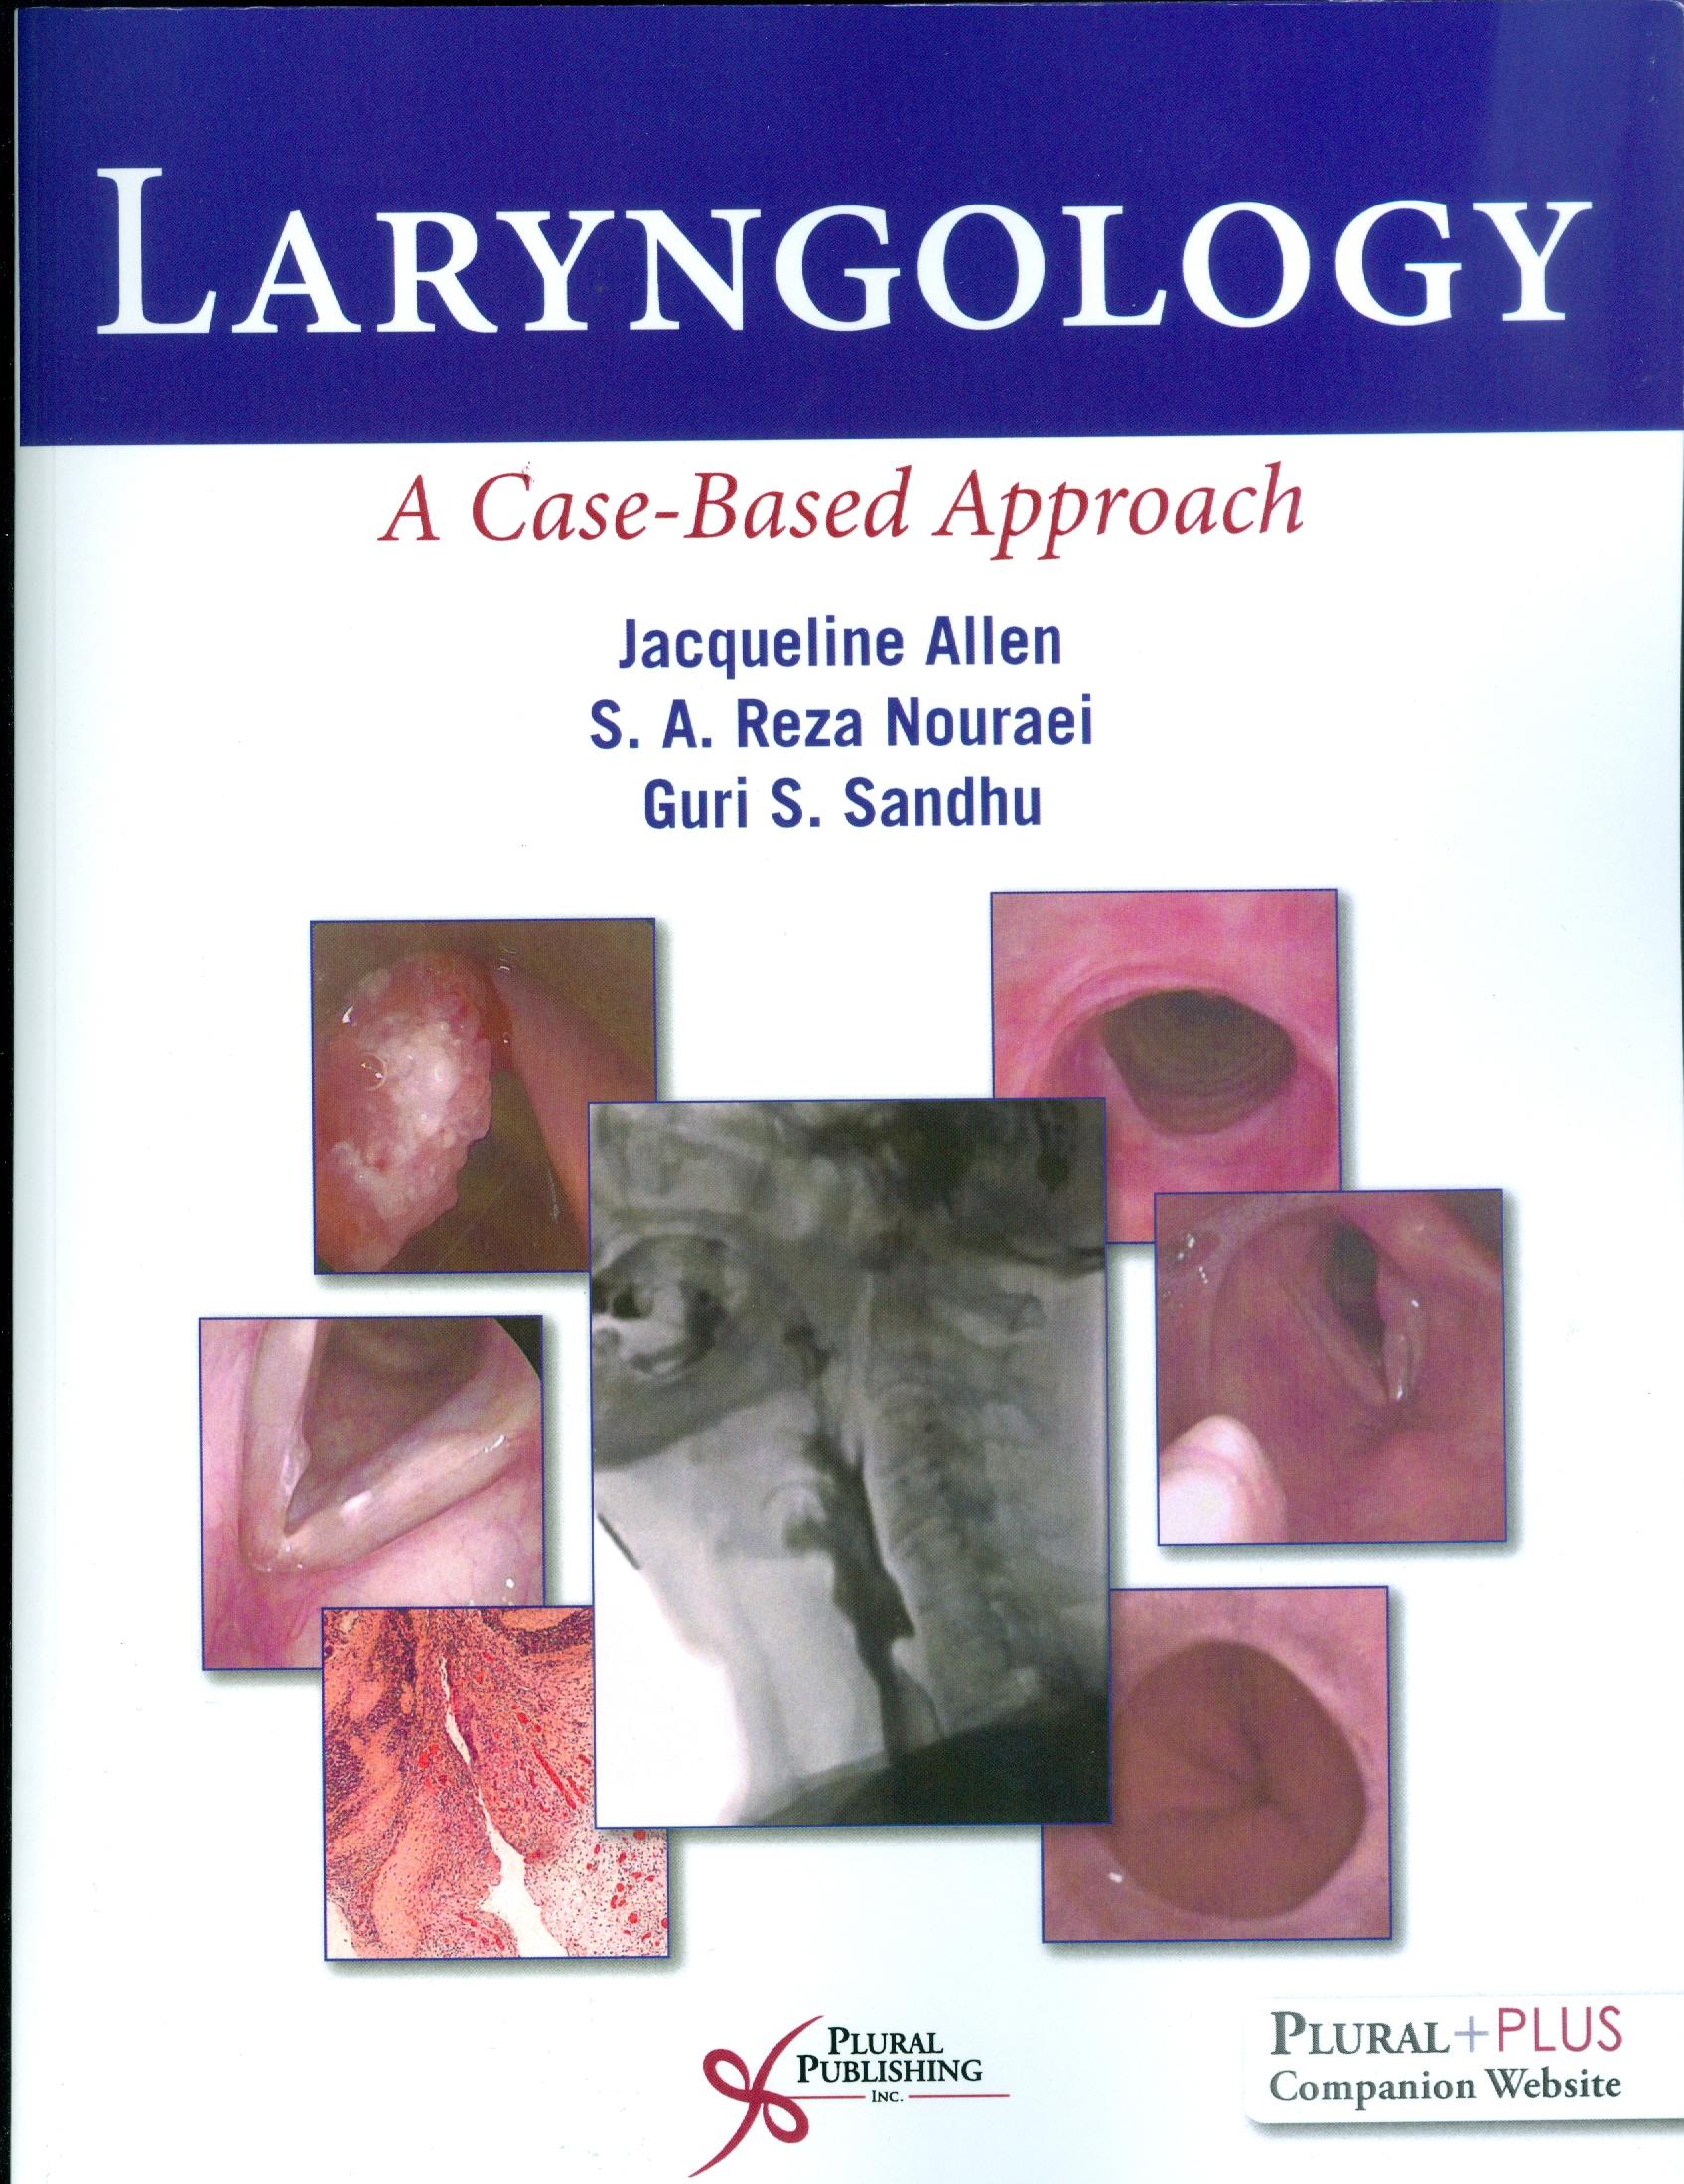 Laryngology: A Case-Based Approach